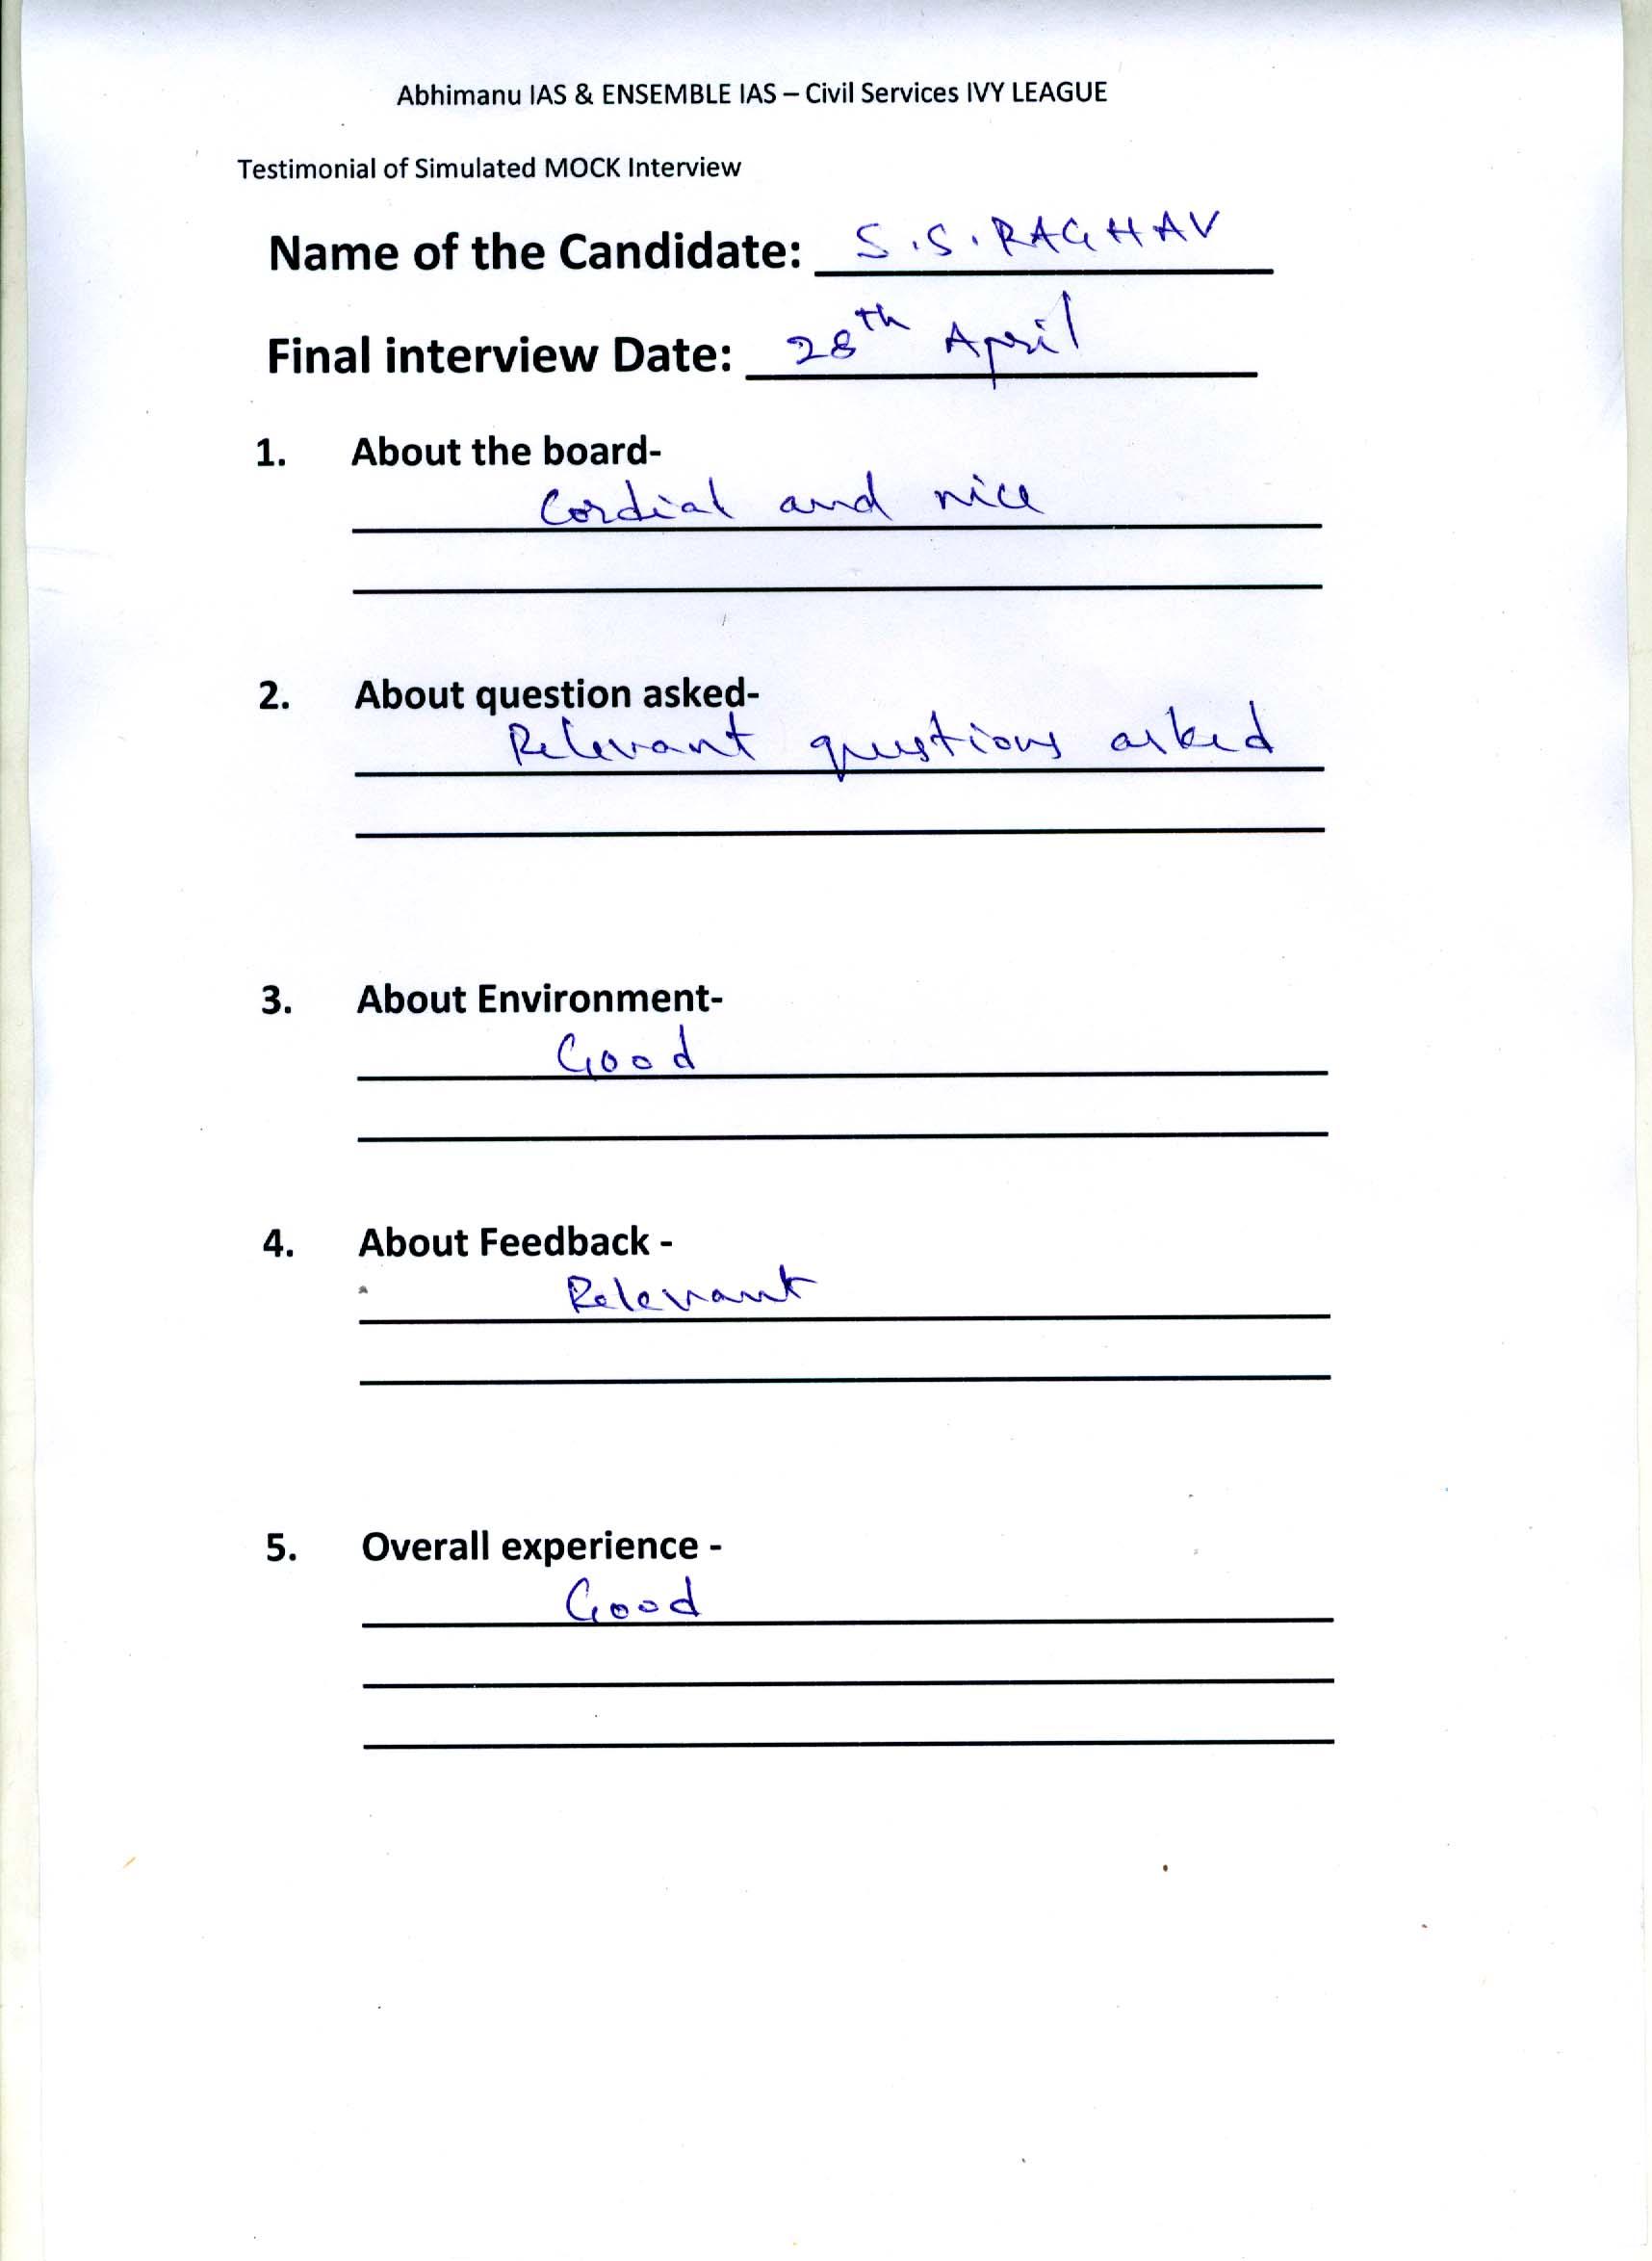 Interview Testimonial By- S.S. Raghav